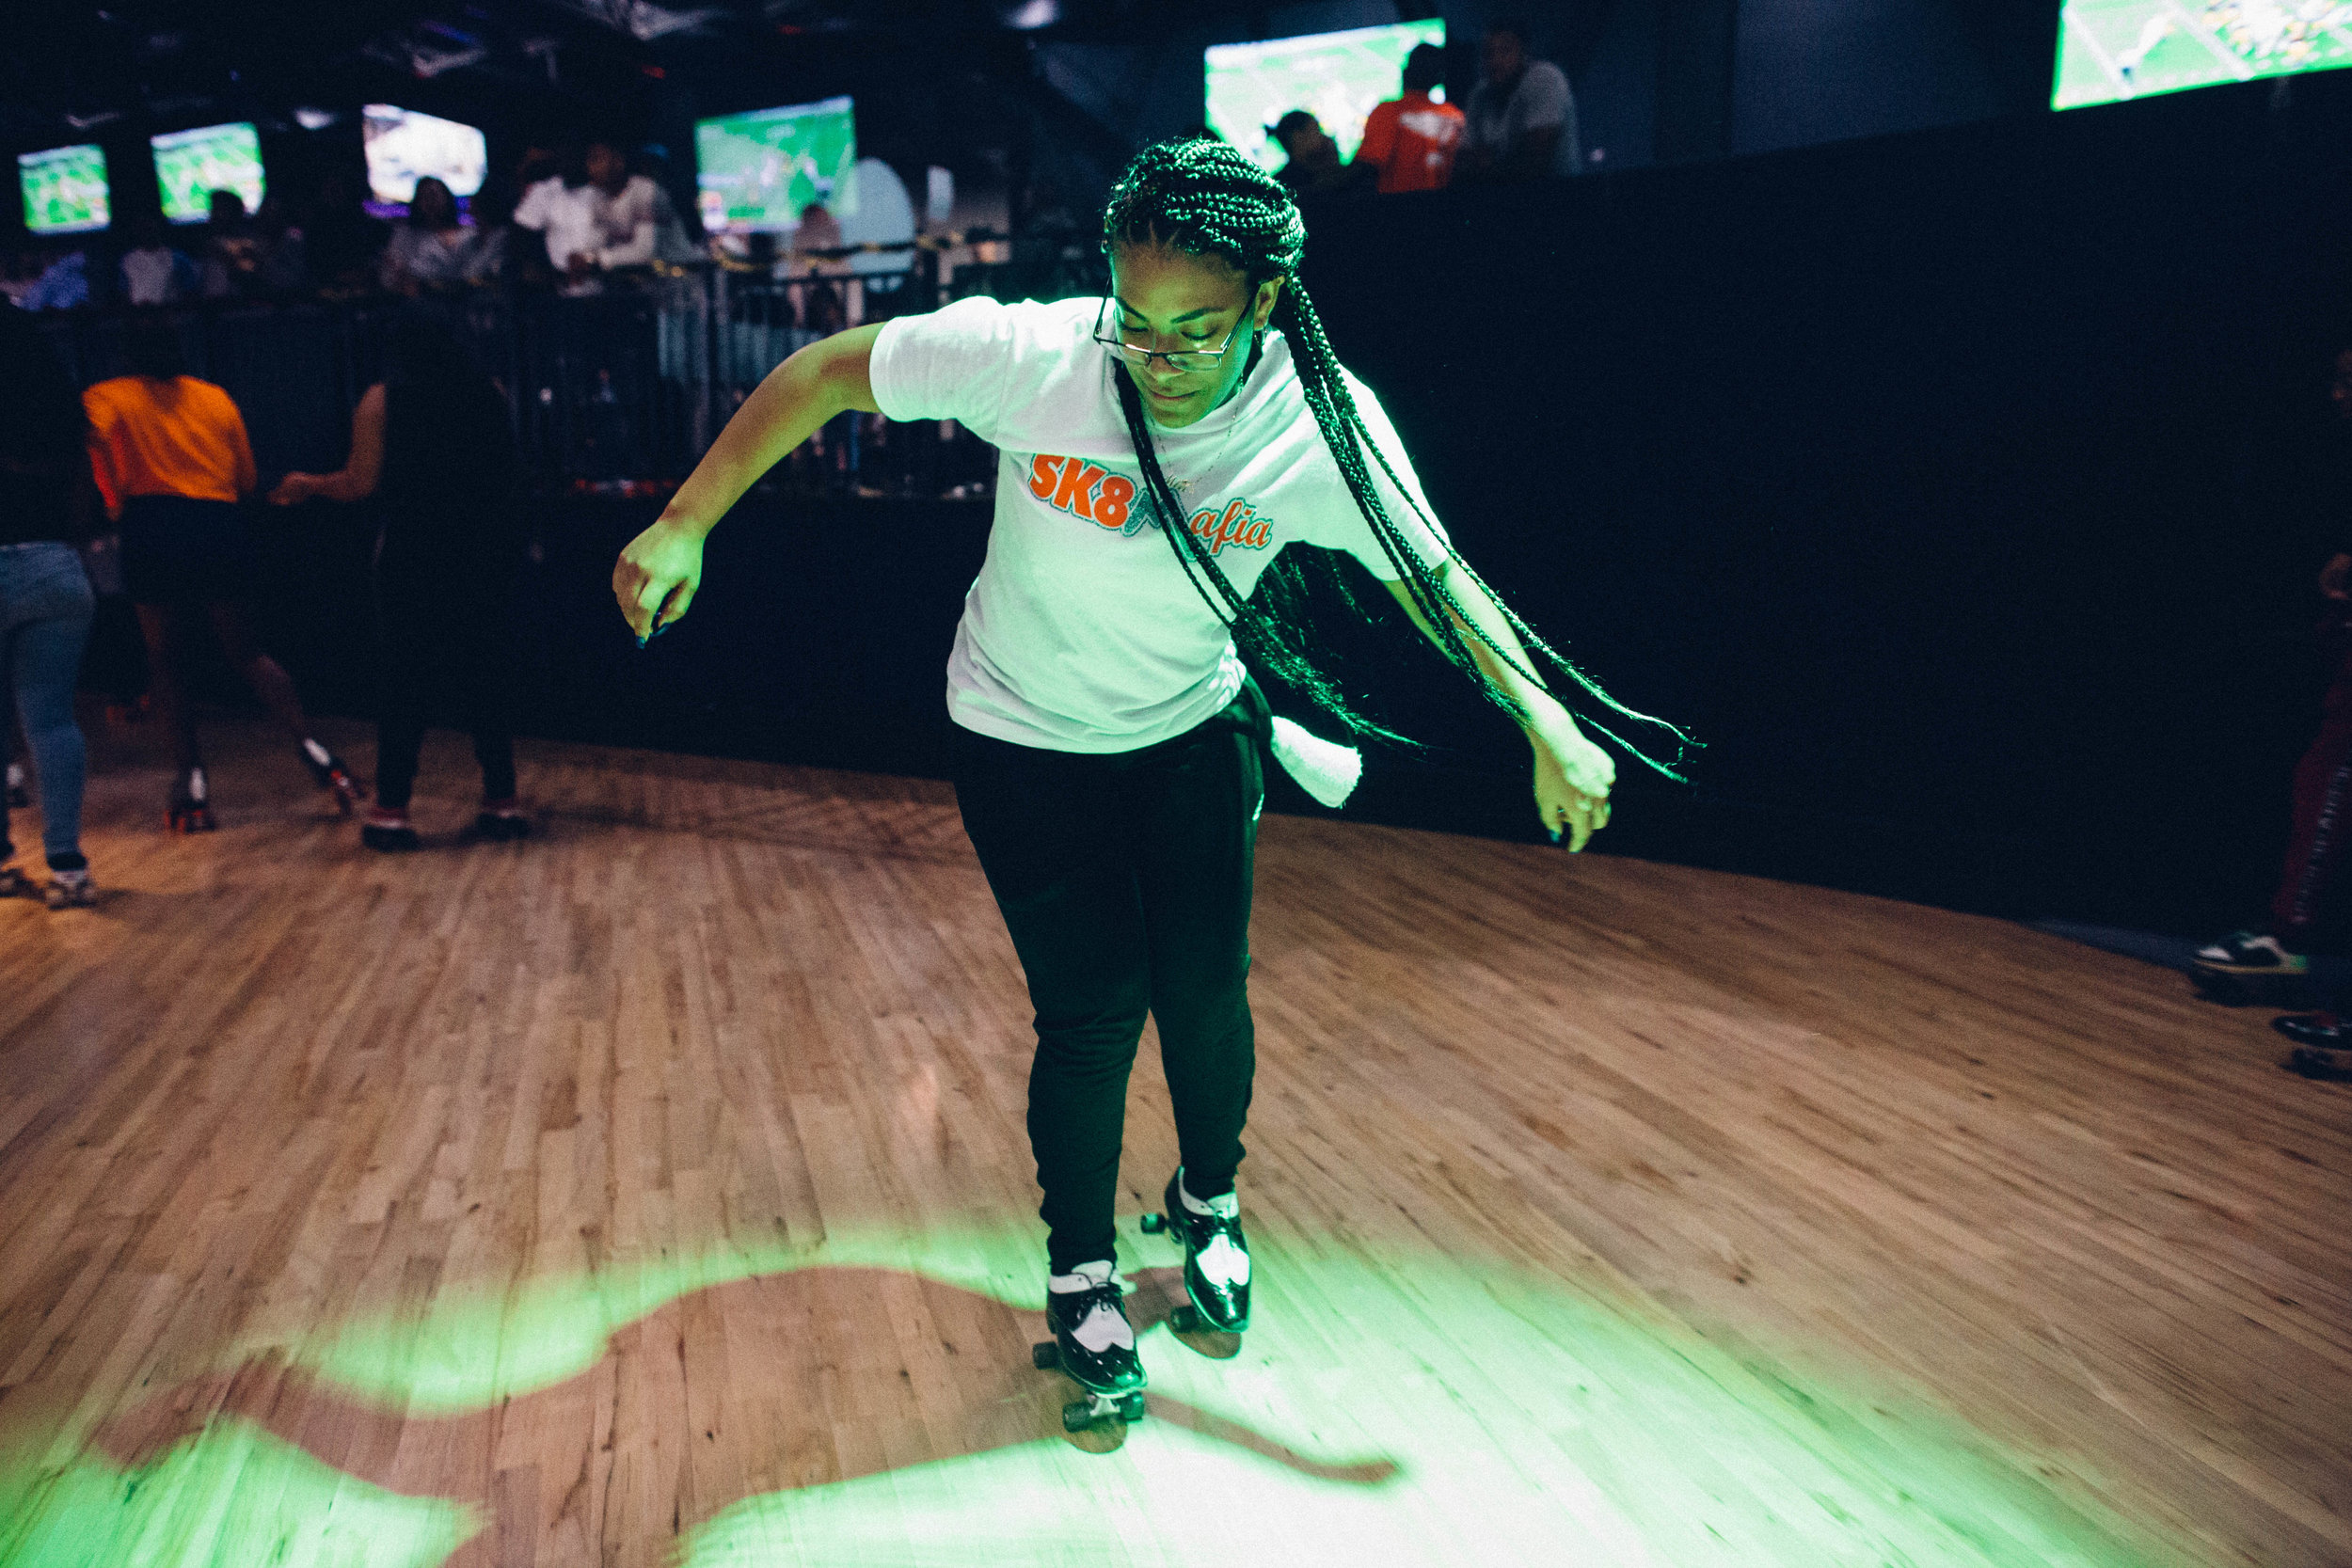 Mia Lopez of Sk8 Mafia skates during College Night at World on Wheels. Los Angeles, California.